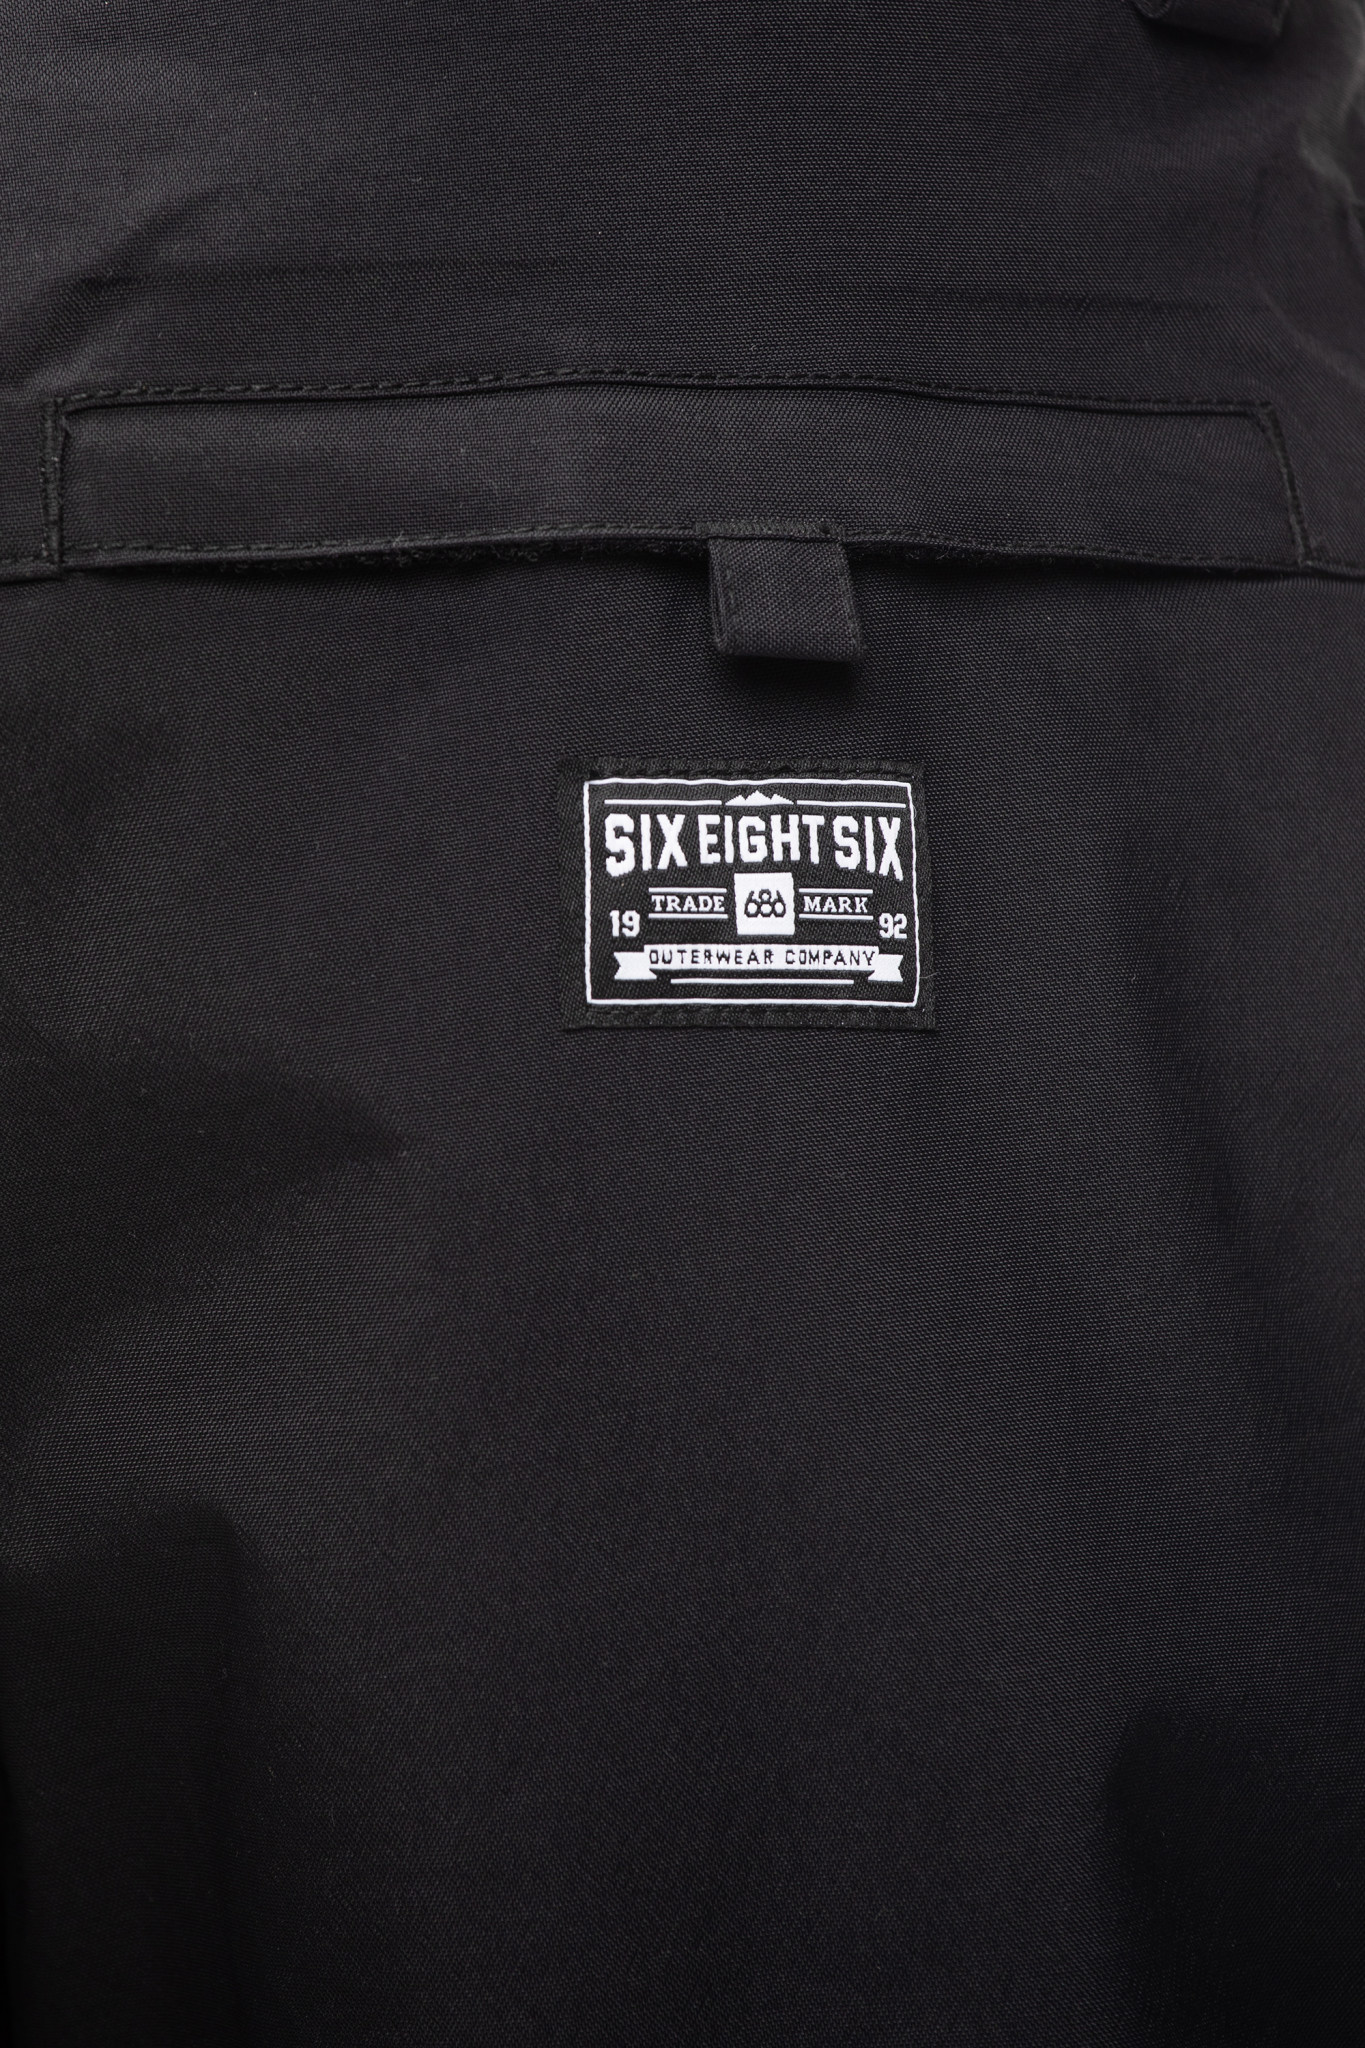 686 686 M's Standard Shell Pant